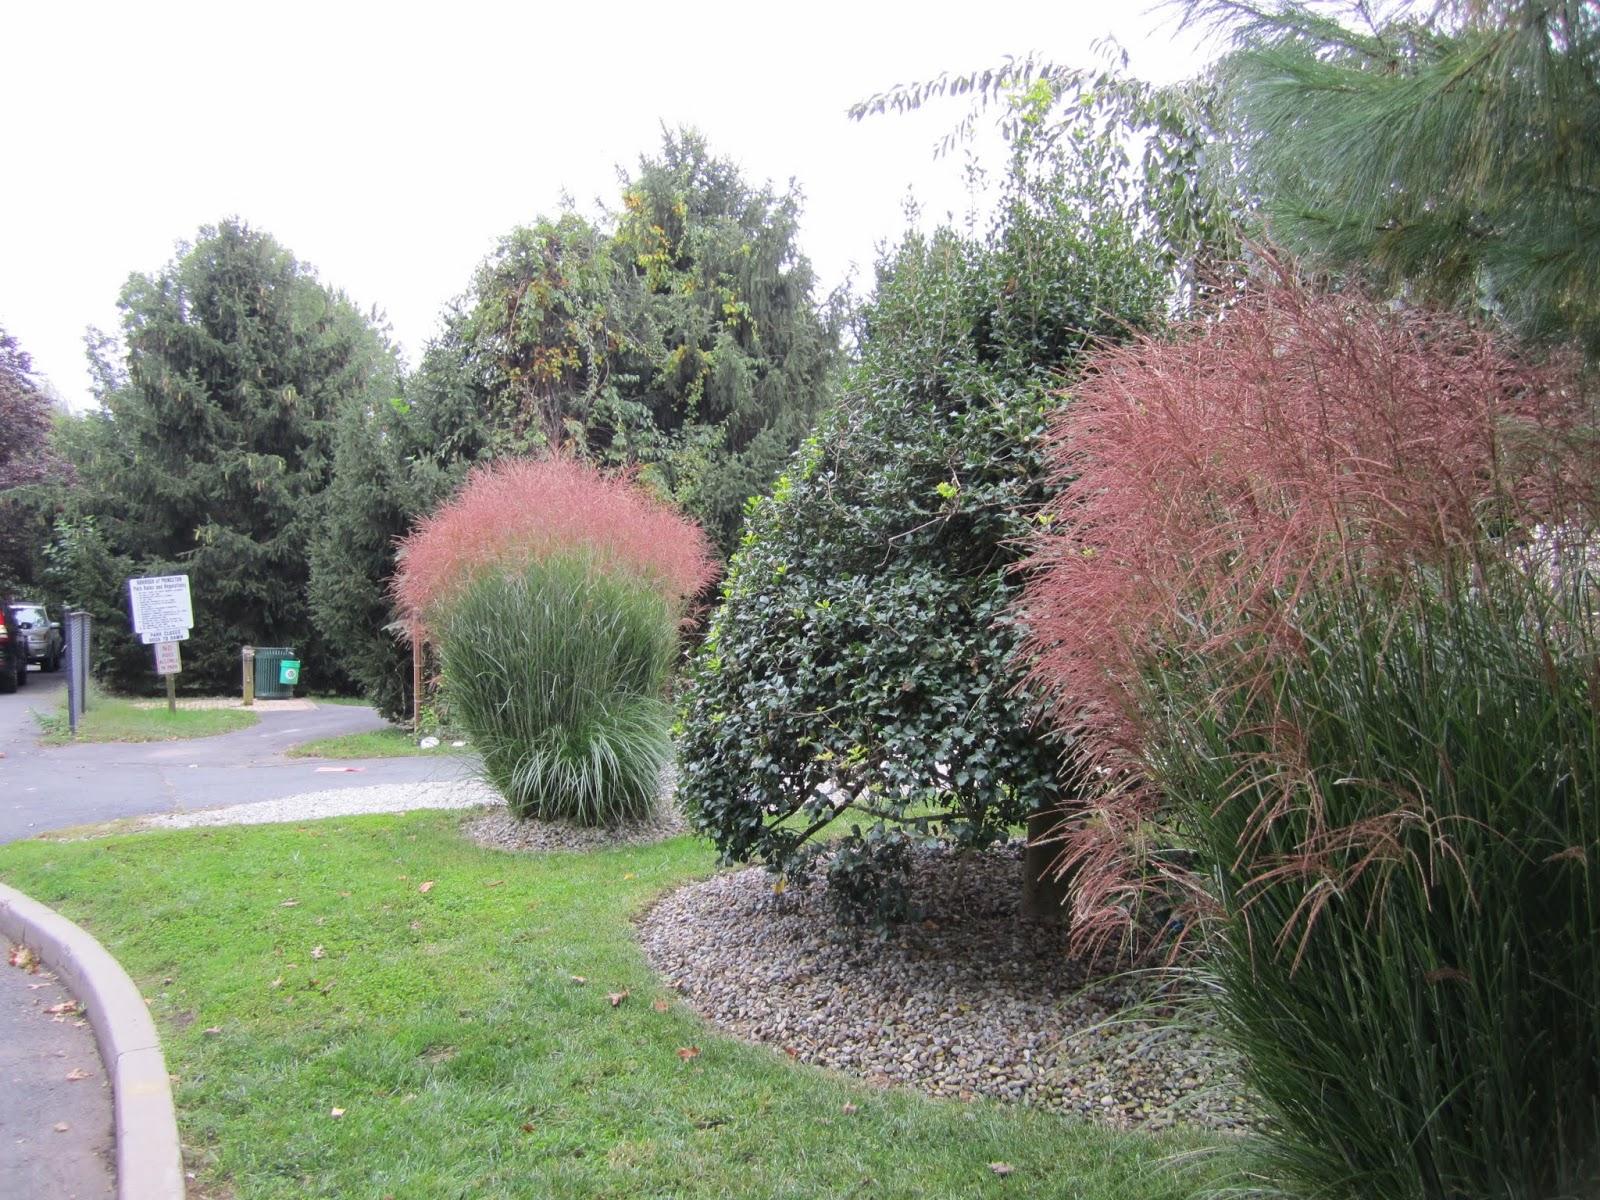 Maiden grass miscanthus sinensis princeton nature notes for Maiden grass